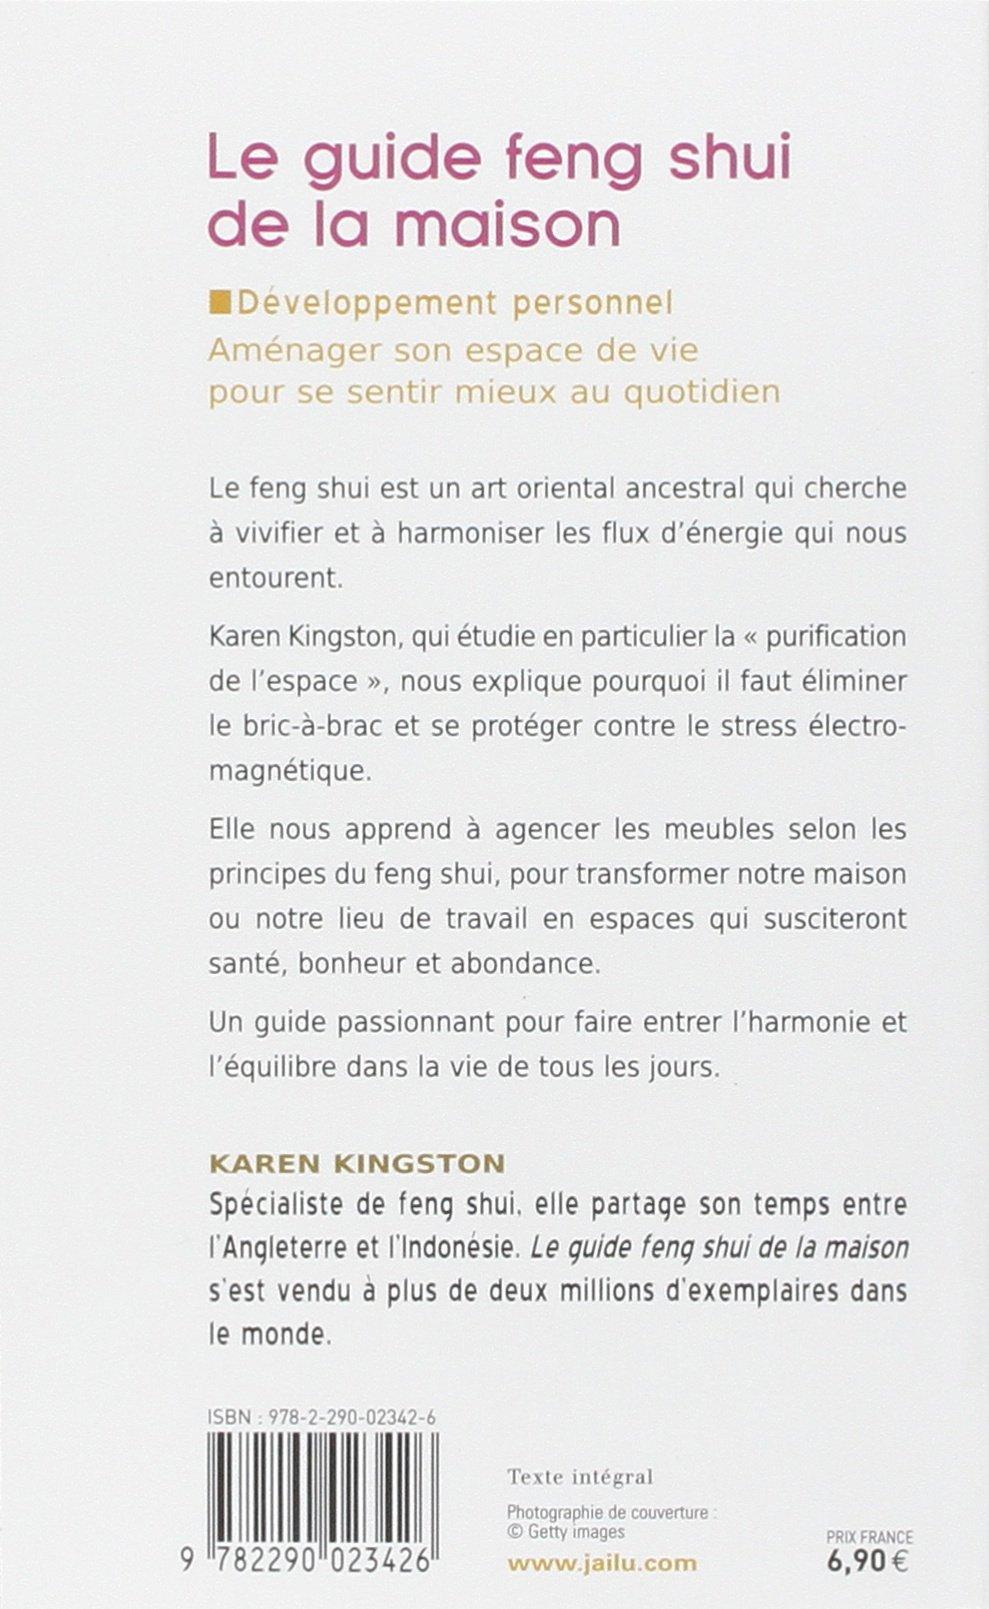 Le Guide Feng Shui De La Maison French Edition Karen Kingston